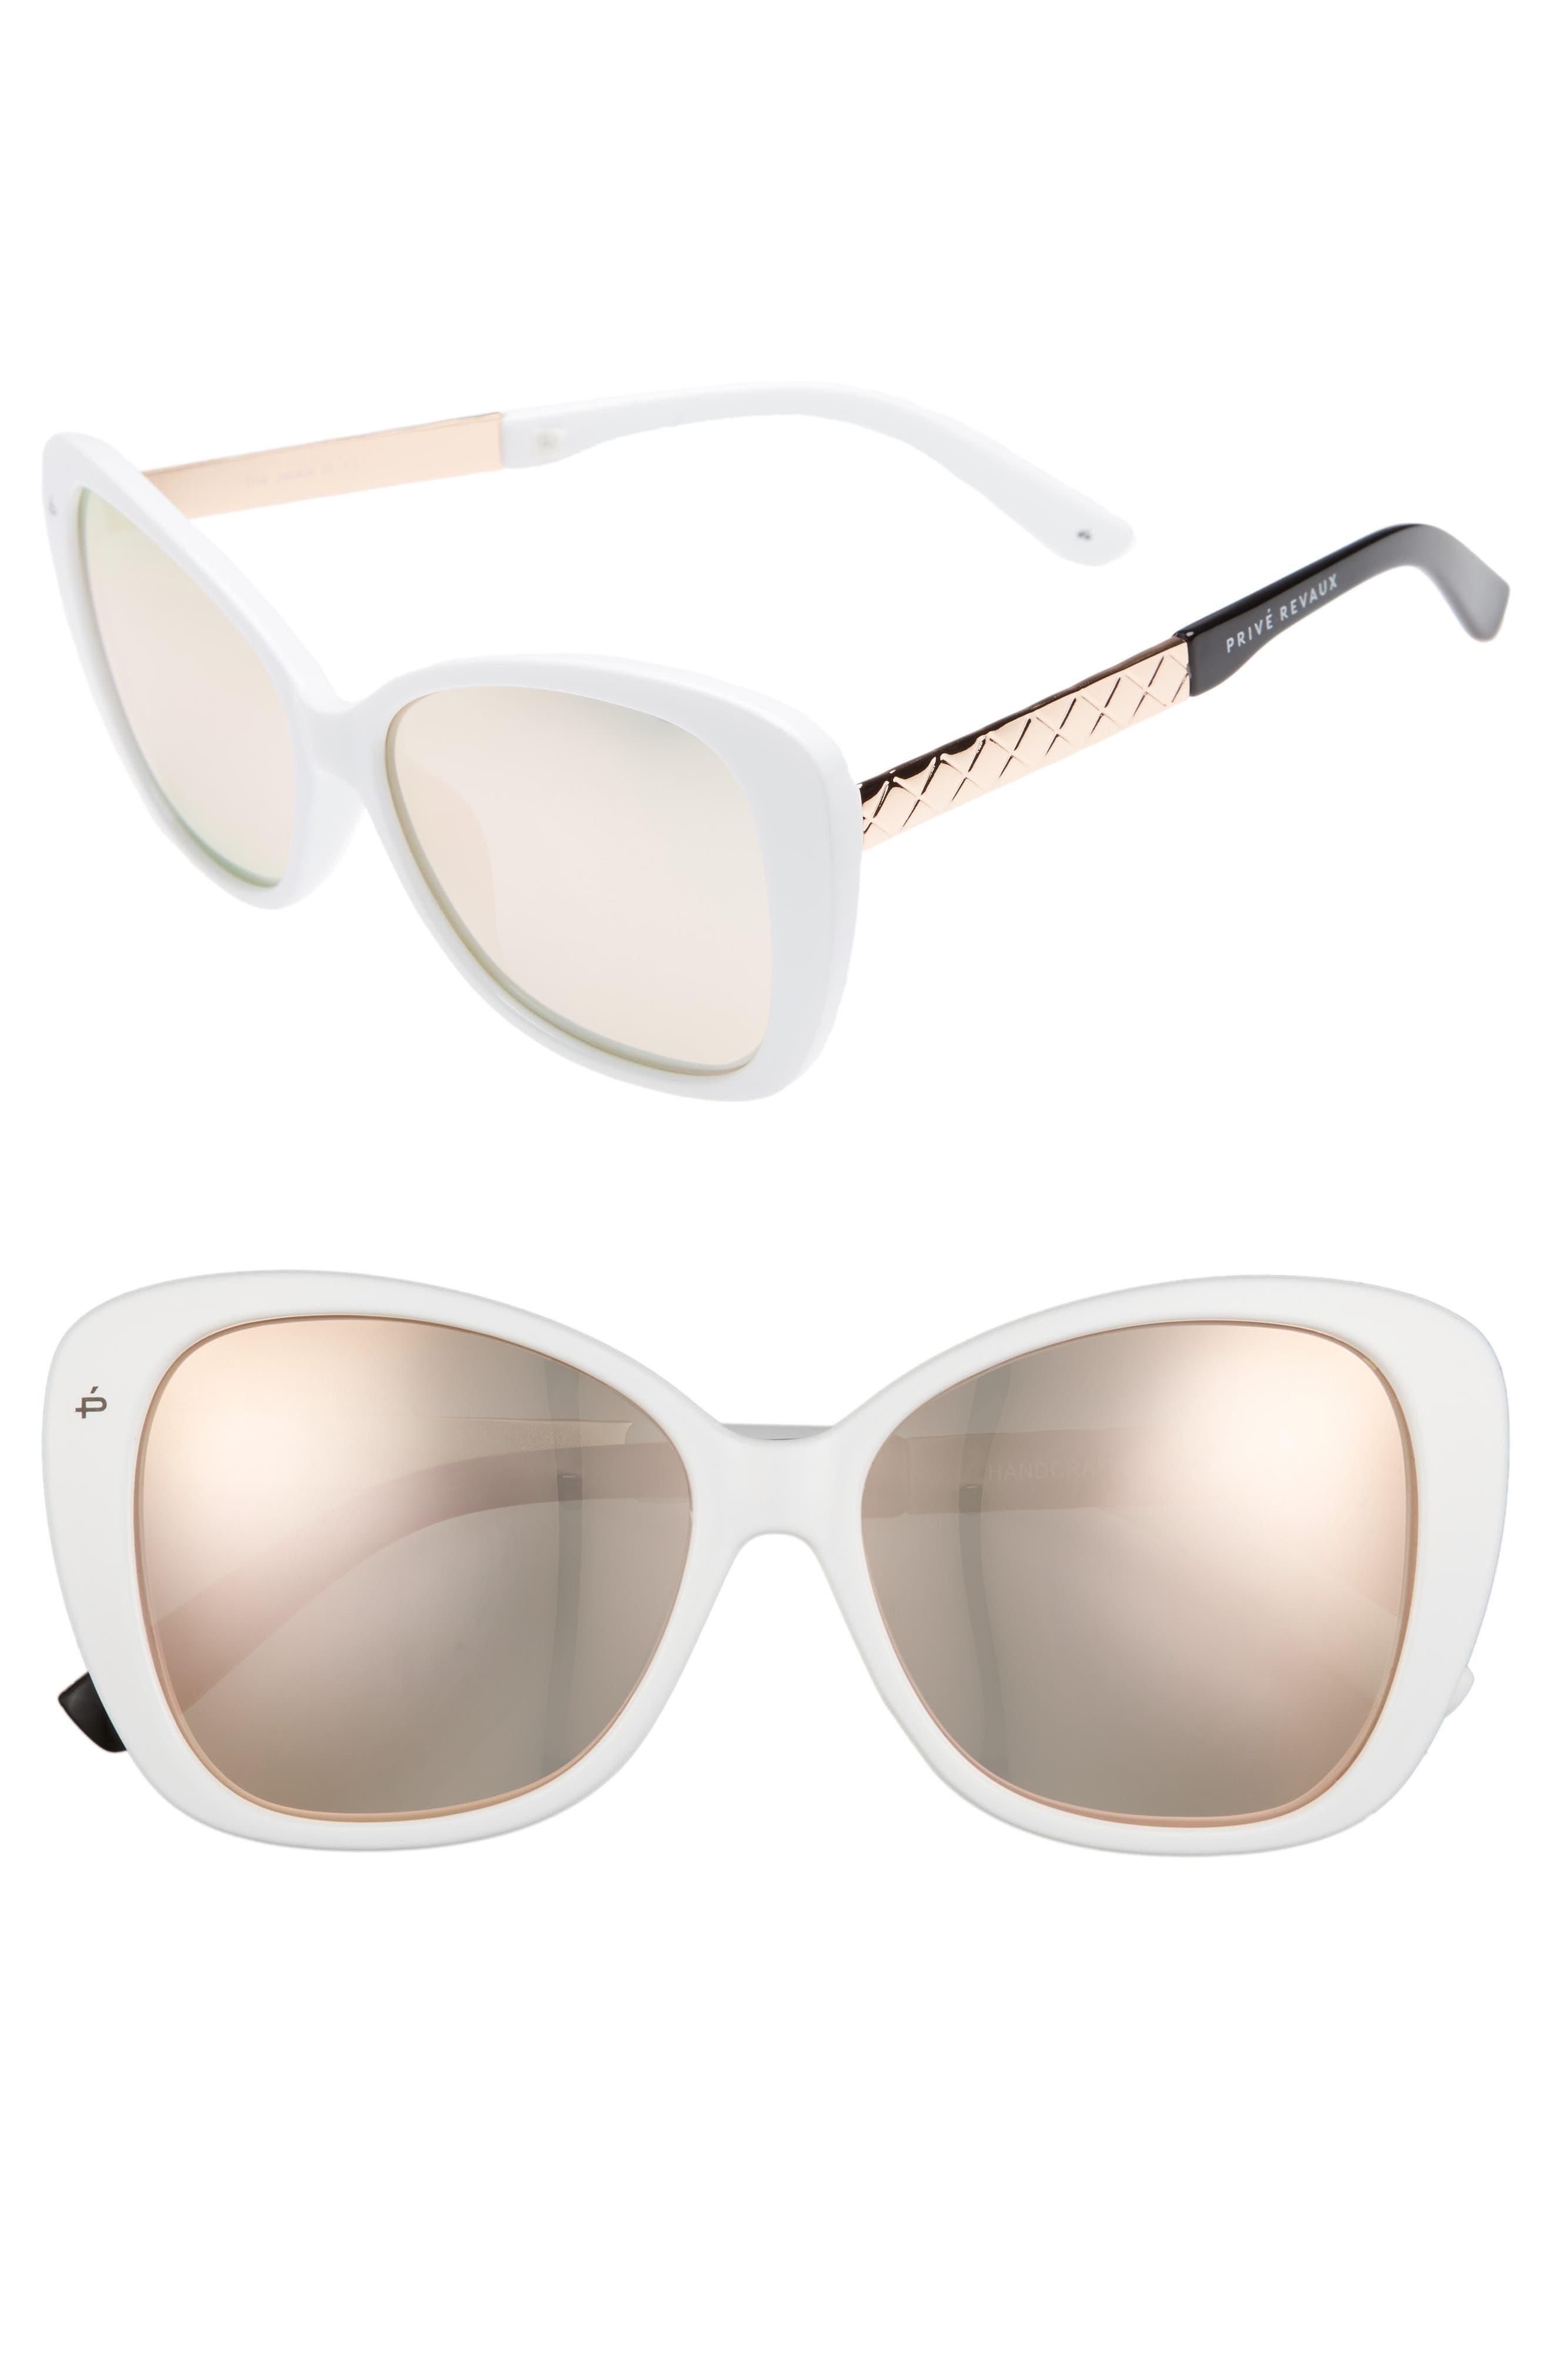 Privé Revaux The Jackie O 56mm Cat Eye Sunglasses,                             Main thumbnail 1, color,                             White Polarized